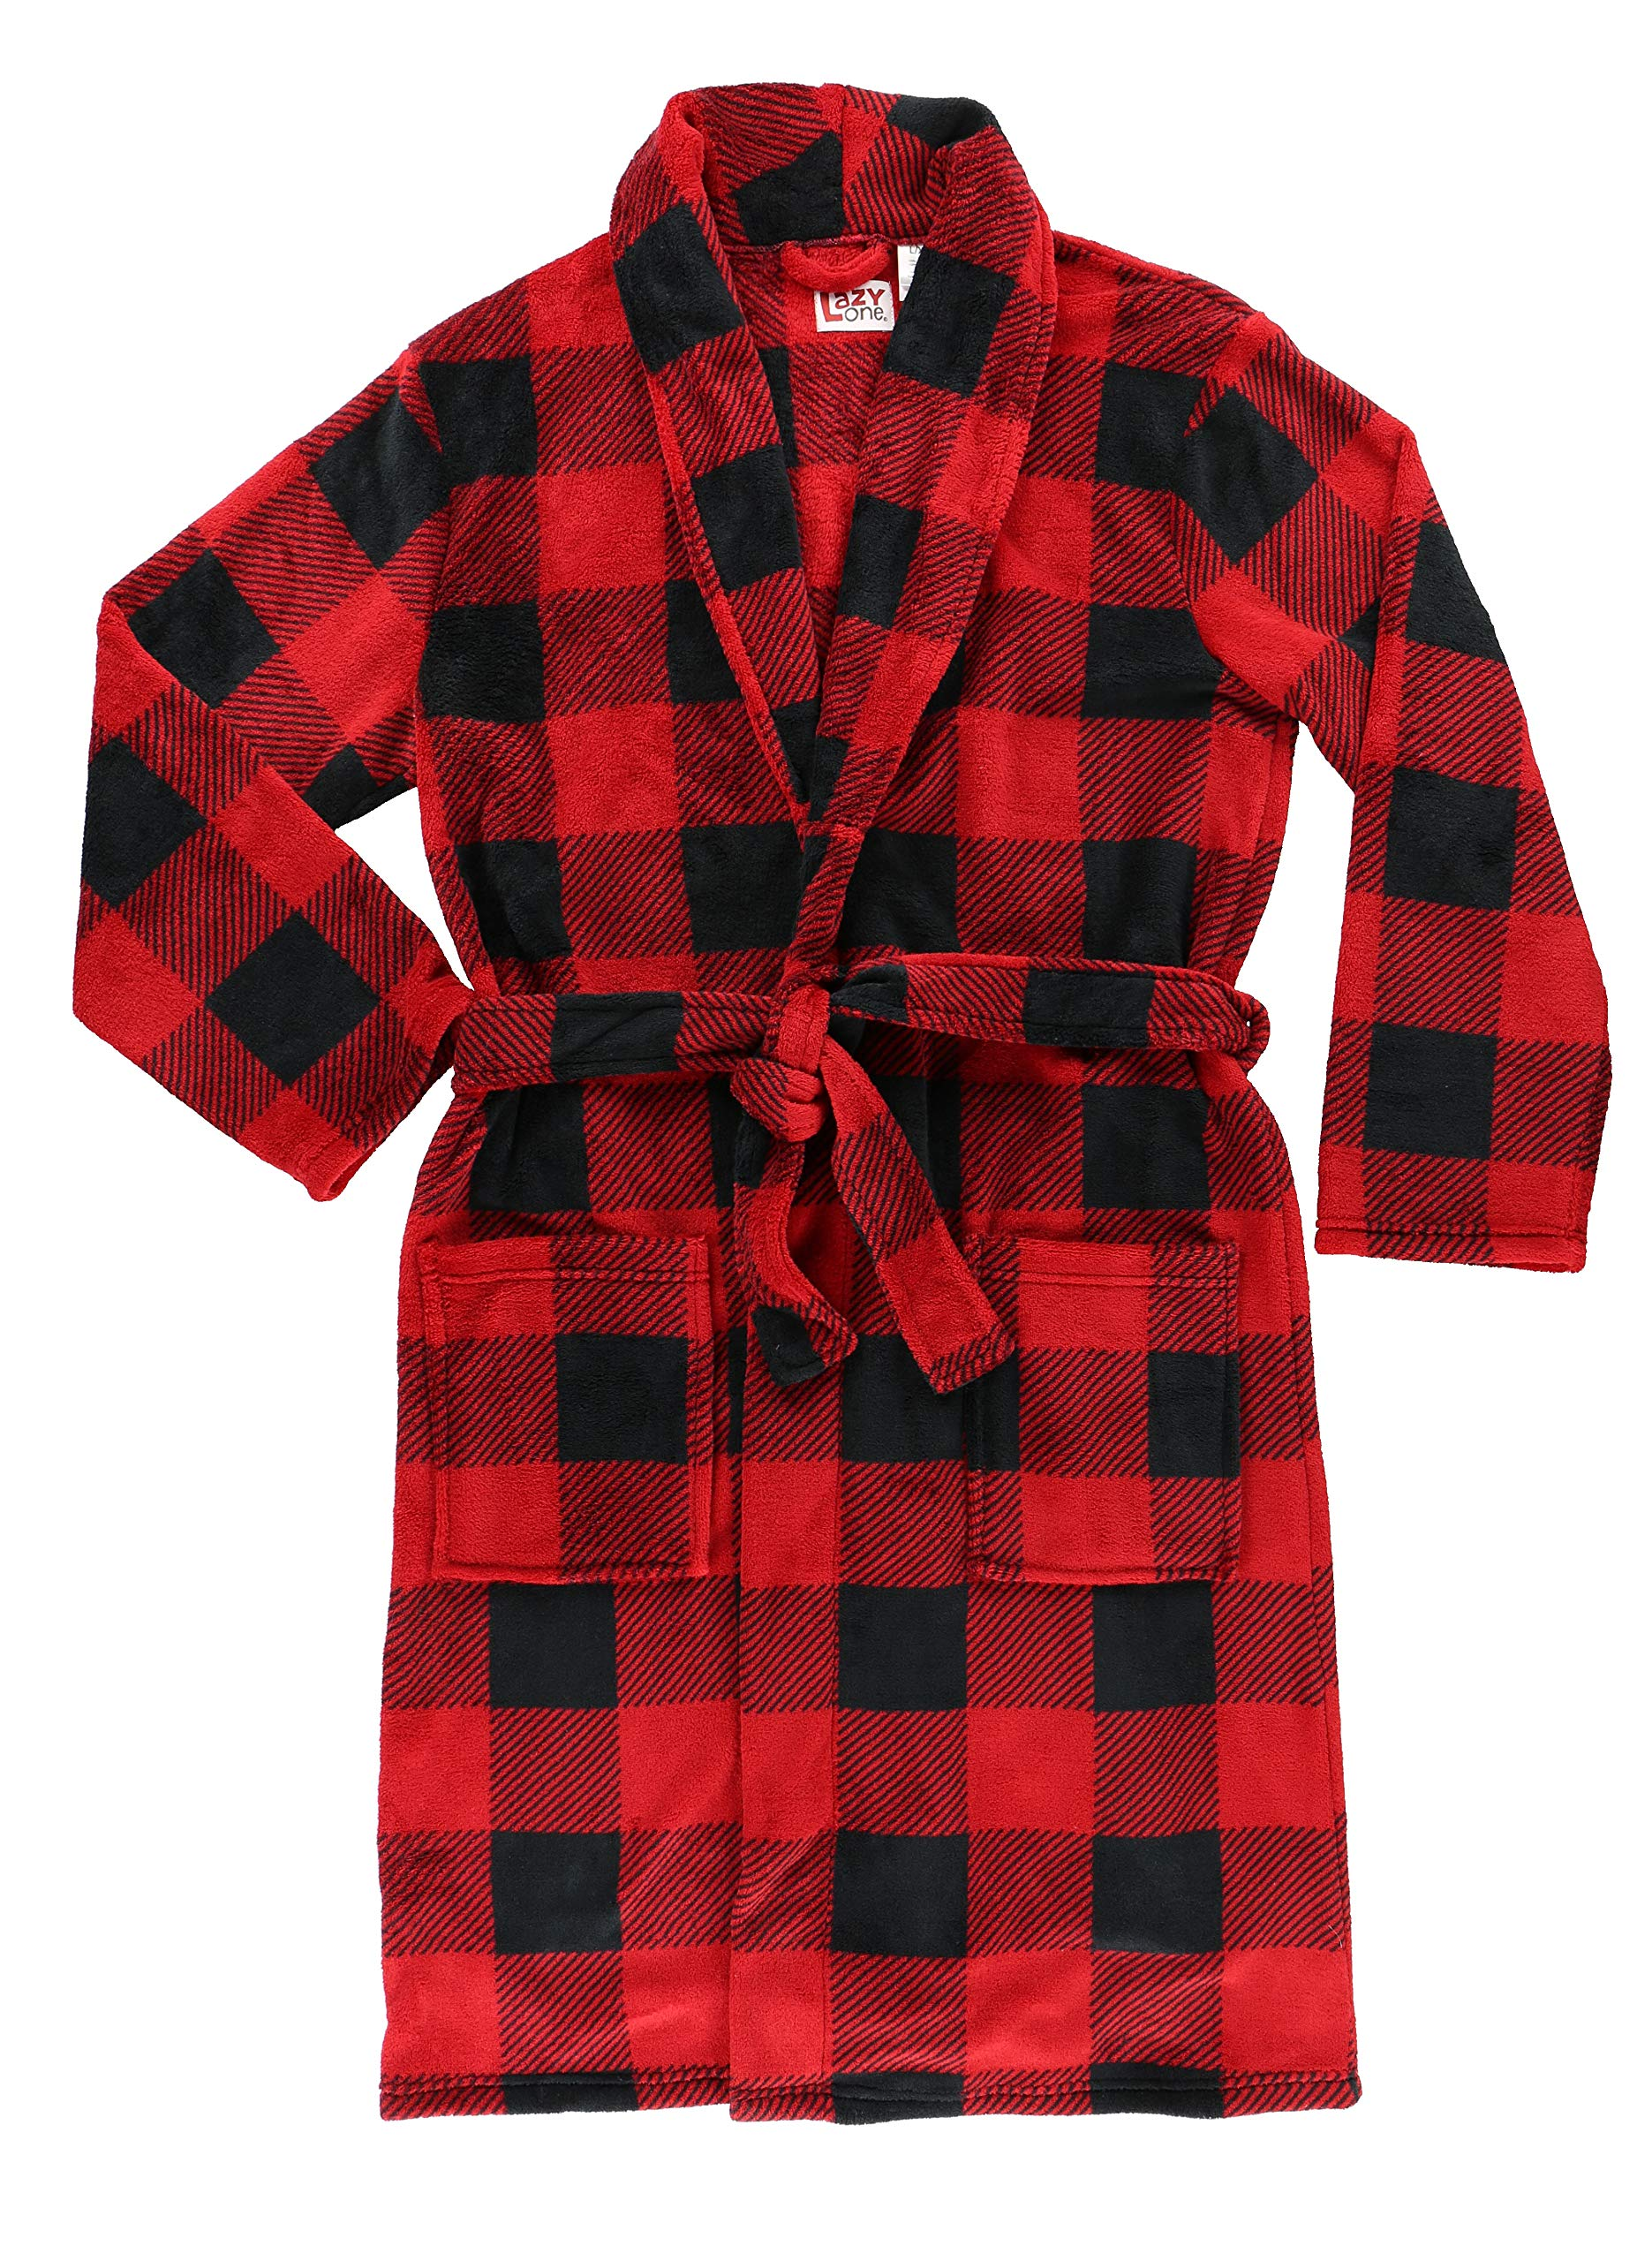 Moose Plaid Soft Bathrobes for Men and Women by LazyOne | Animal Pattern Plush Robes Unisex (L/XL)